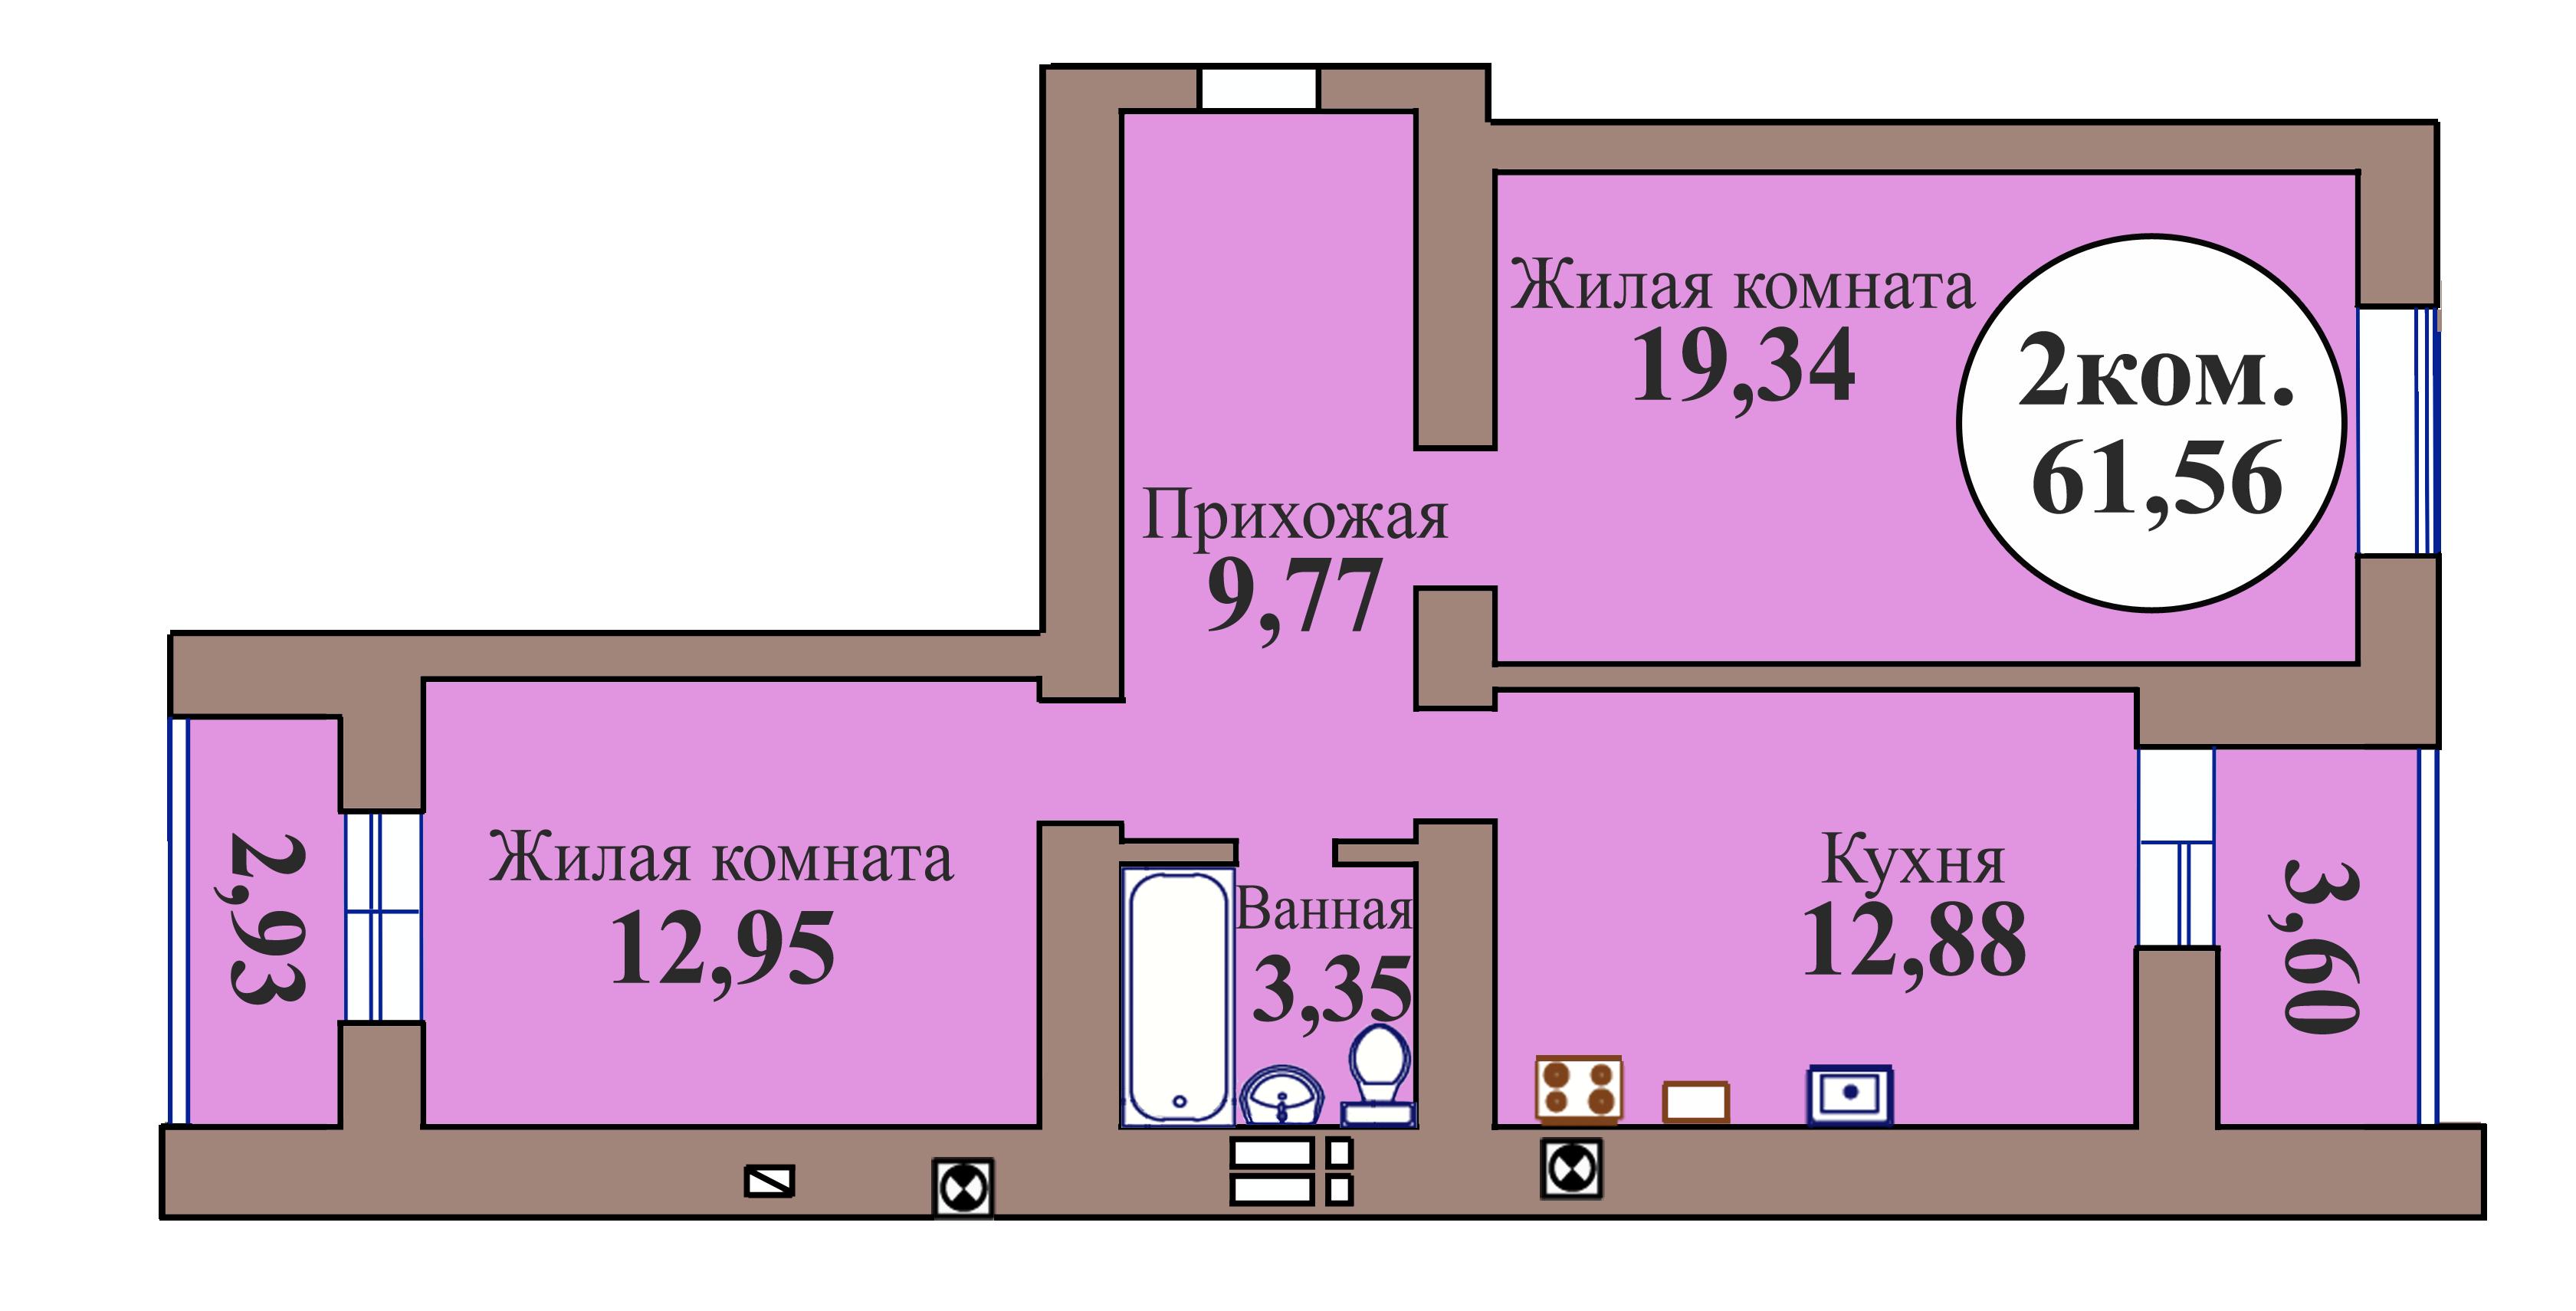 2-комн. кв. по пер. Калининградский, 5 кв. 101 в Калининграде